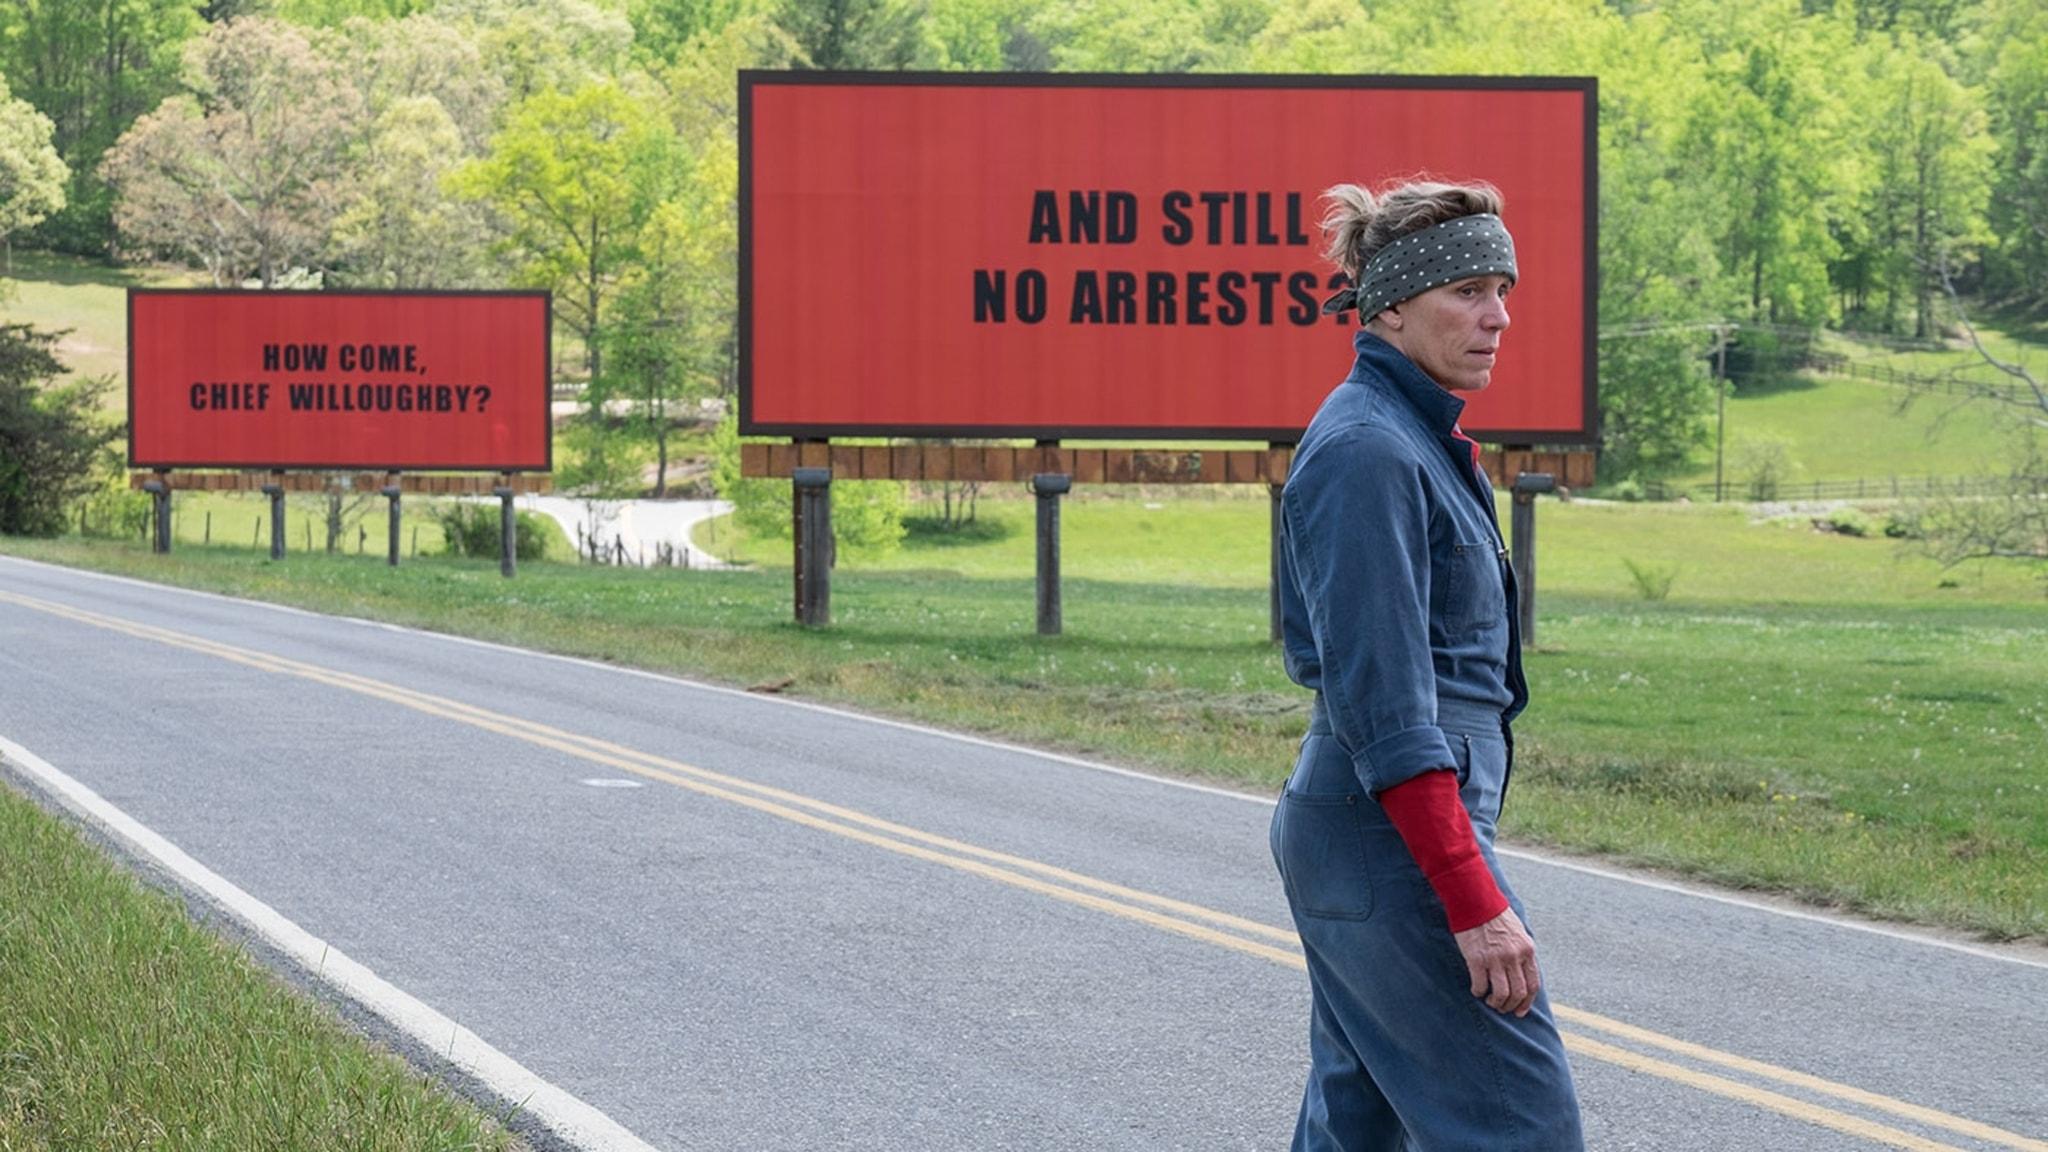 Frances McDormand i Three billboards outside Ebbing, Missouri. Foto: Fox Movies.